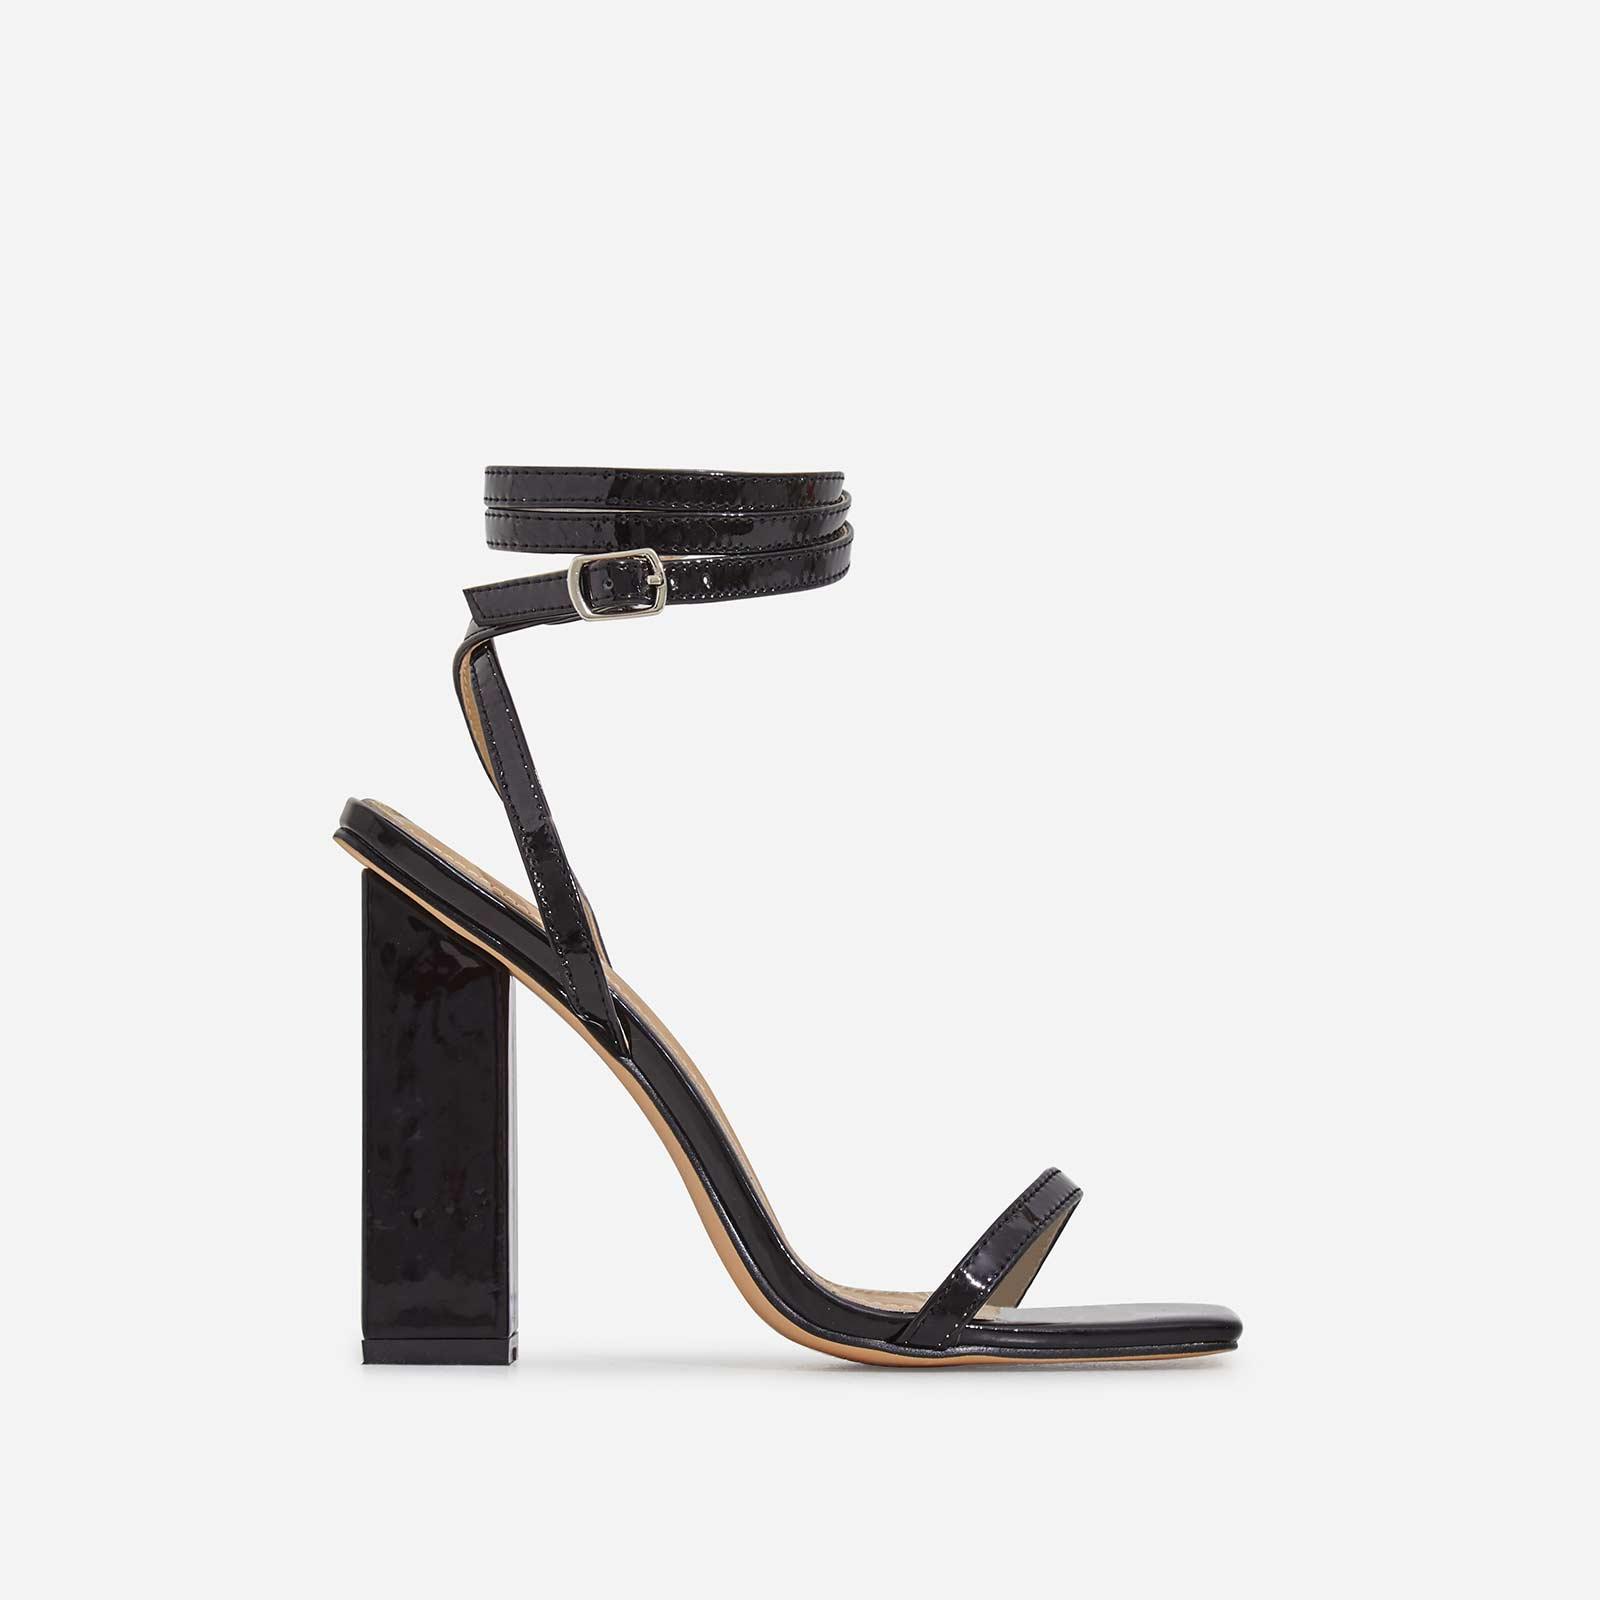 Lauve Lace Up Square Toe Block Heel In Black Patent